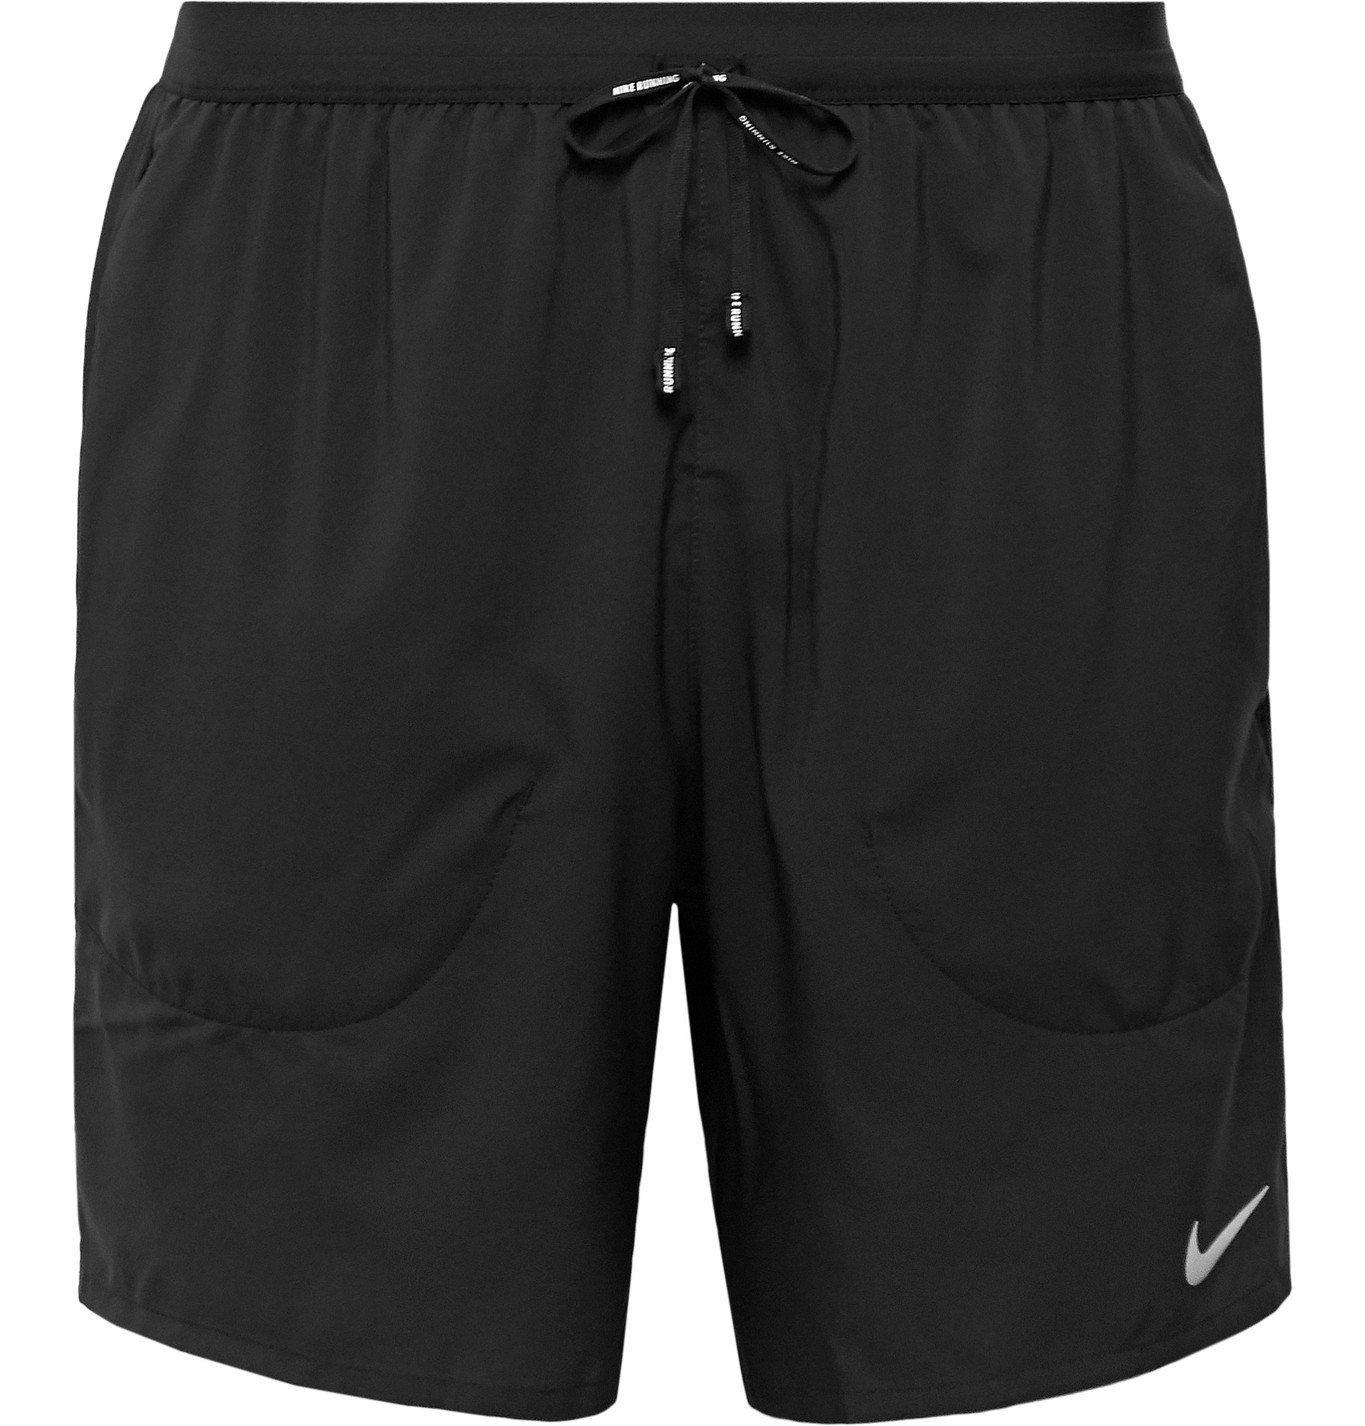 Nike Running - Flex Stride Slim-Fit Dri-FIT Shorts - Black